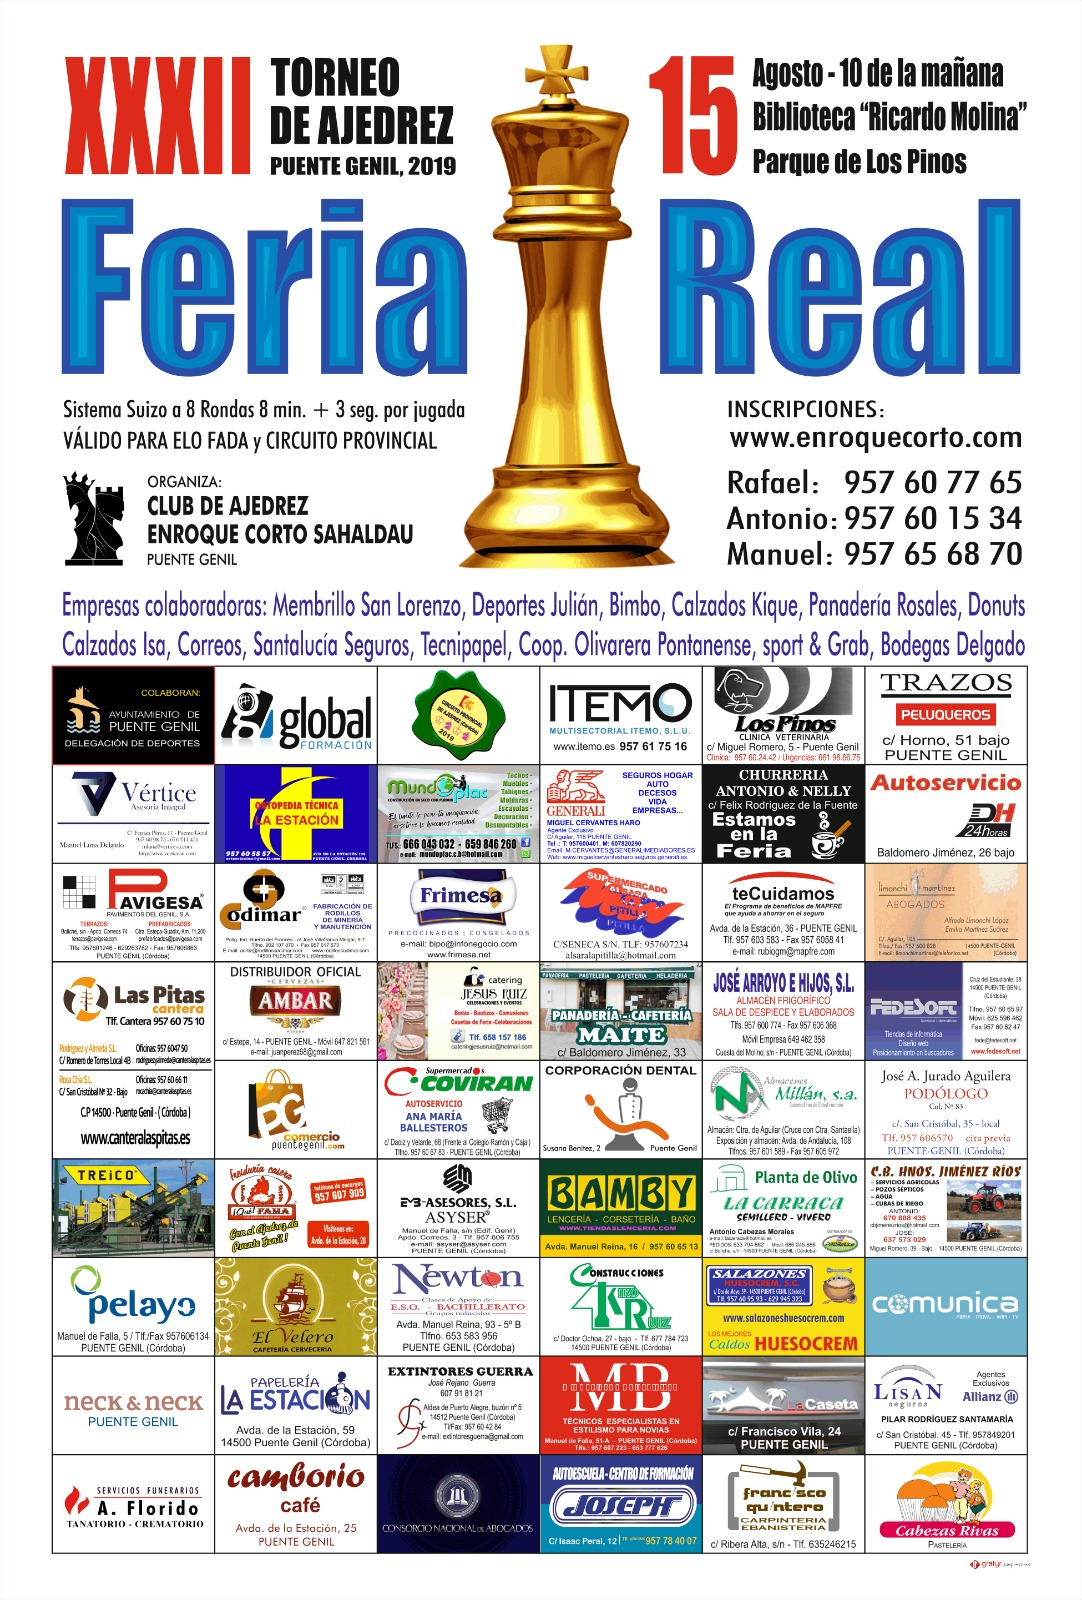 Torneo Ajedrez Feria Puente Genil 2019 Empresas